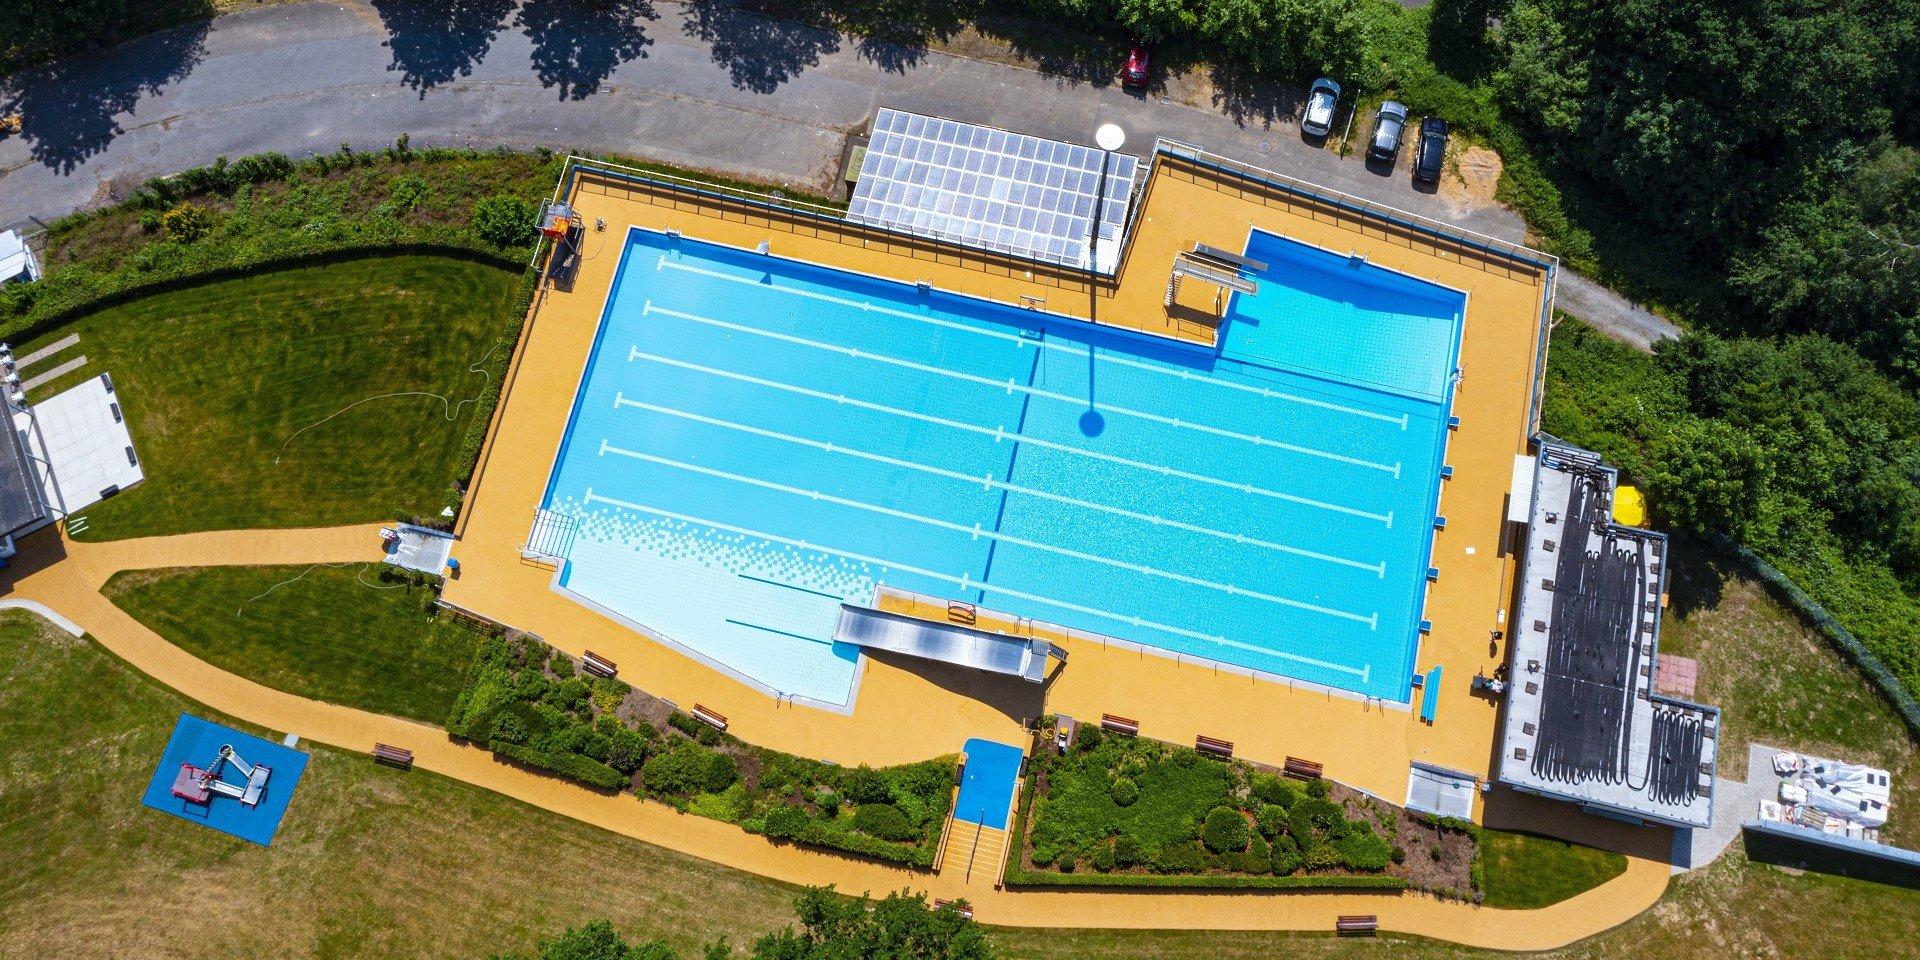 Panoramabad Engelskirchen Luftbild | Steuler Pool Linings